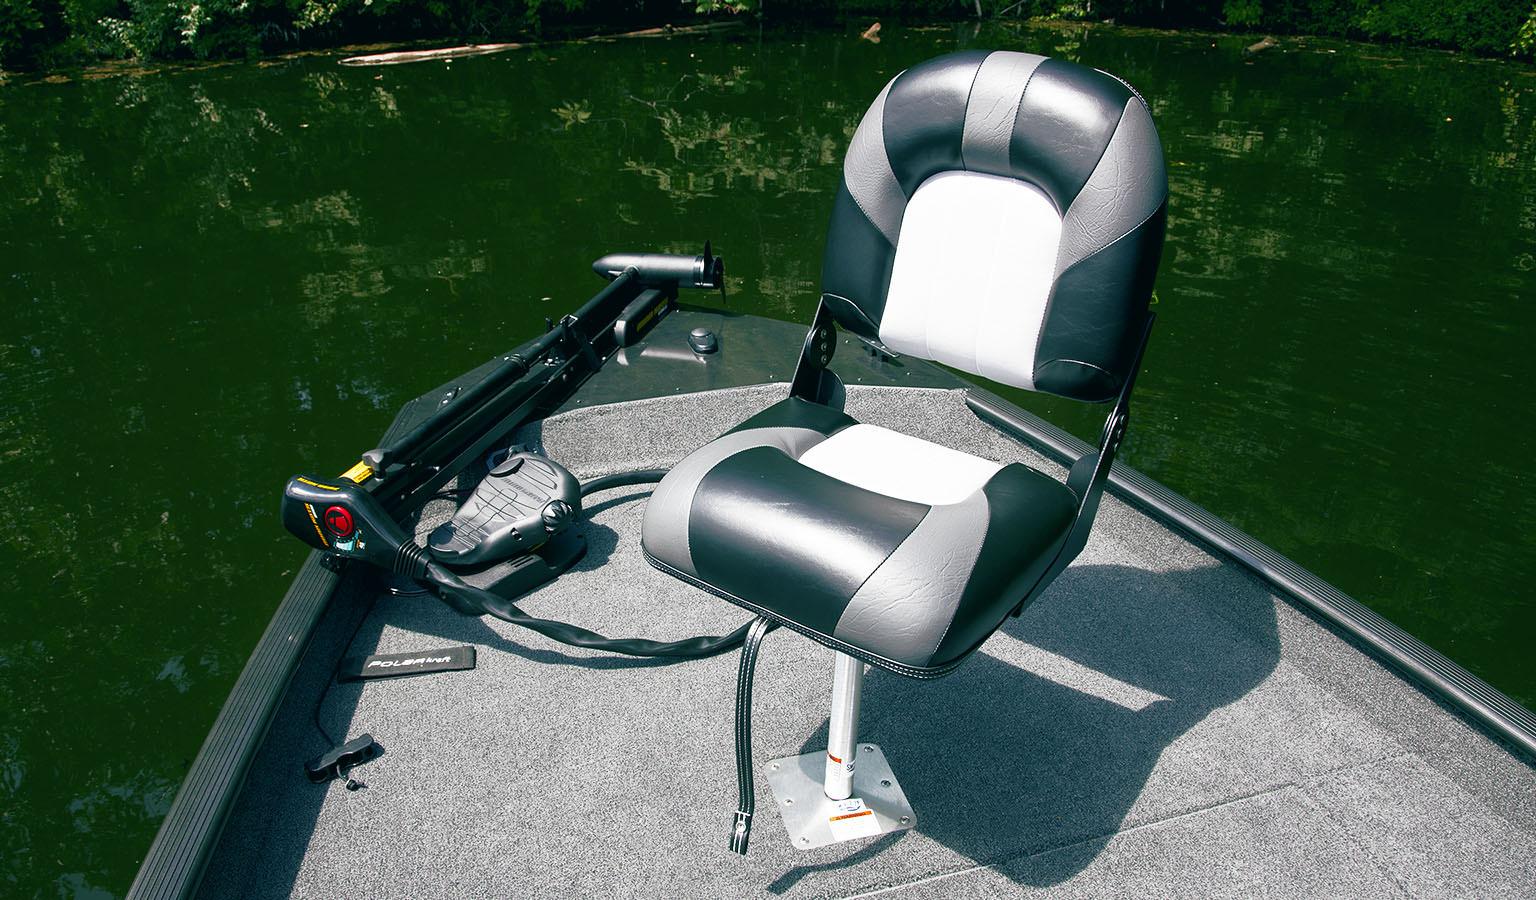 Reel in the deals - Helm & Fishing Seats